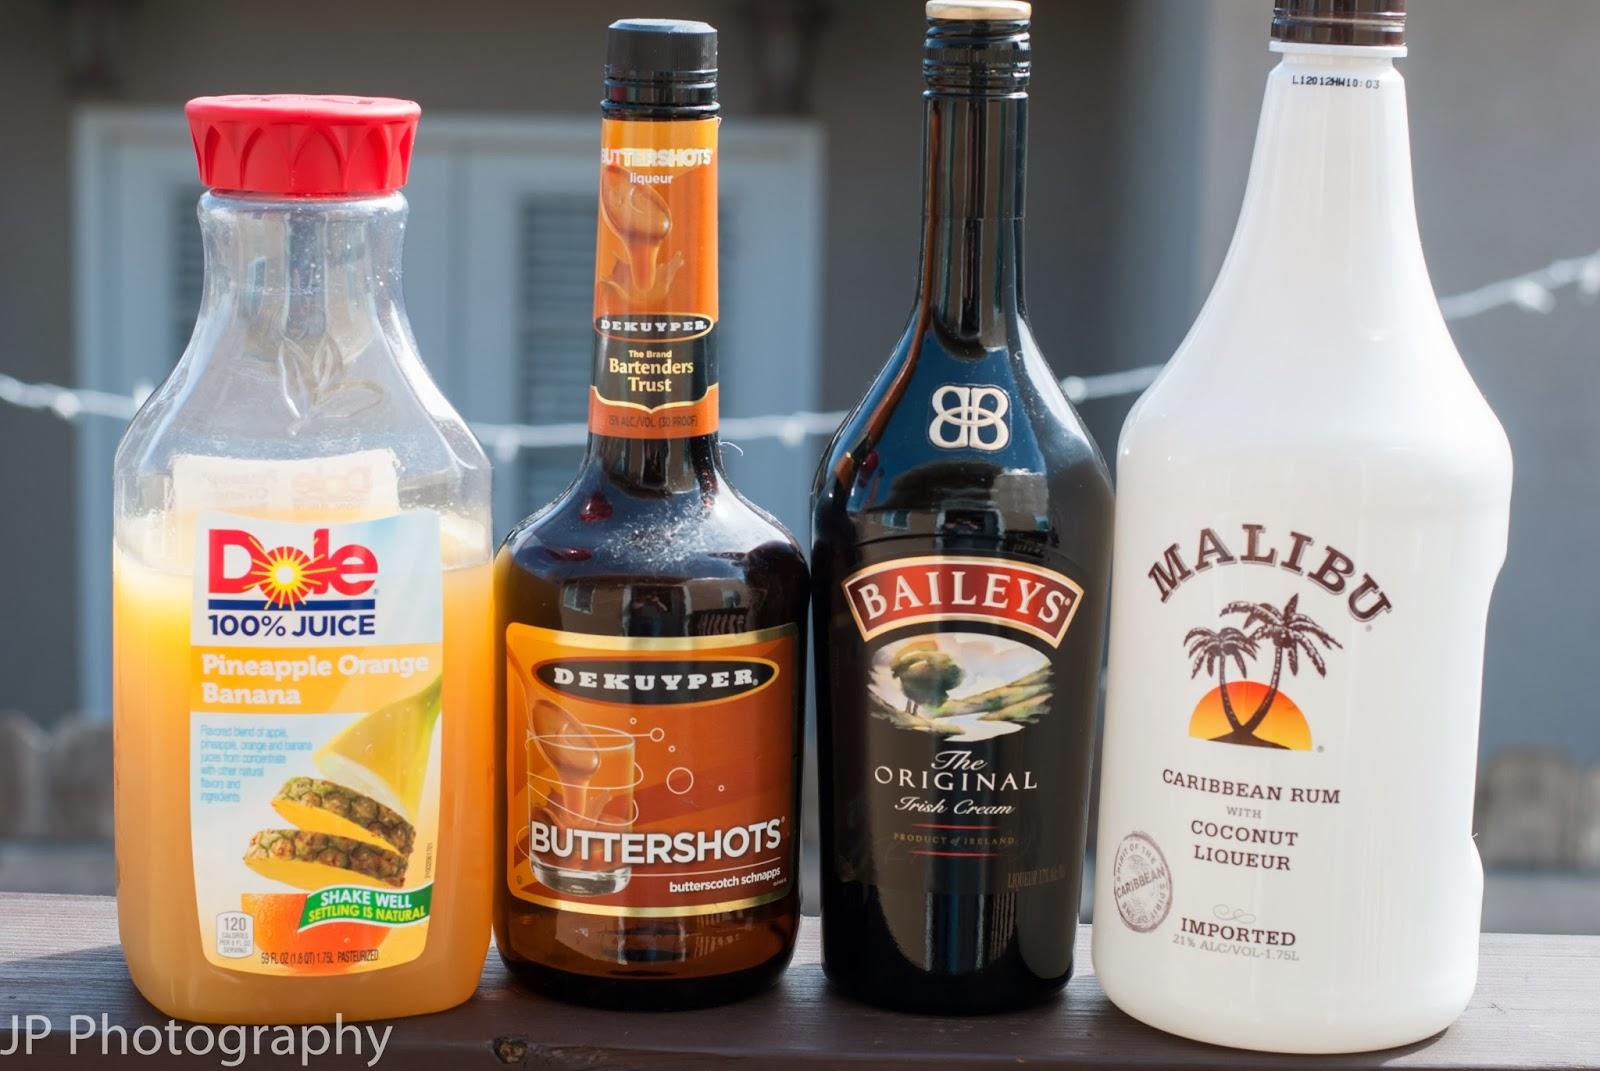 Butternut+Rum+Lifesaver+2.jpg